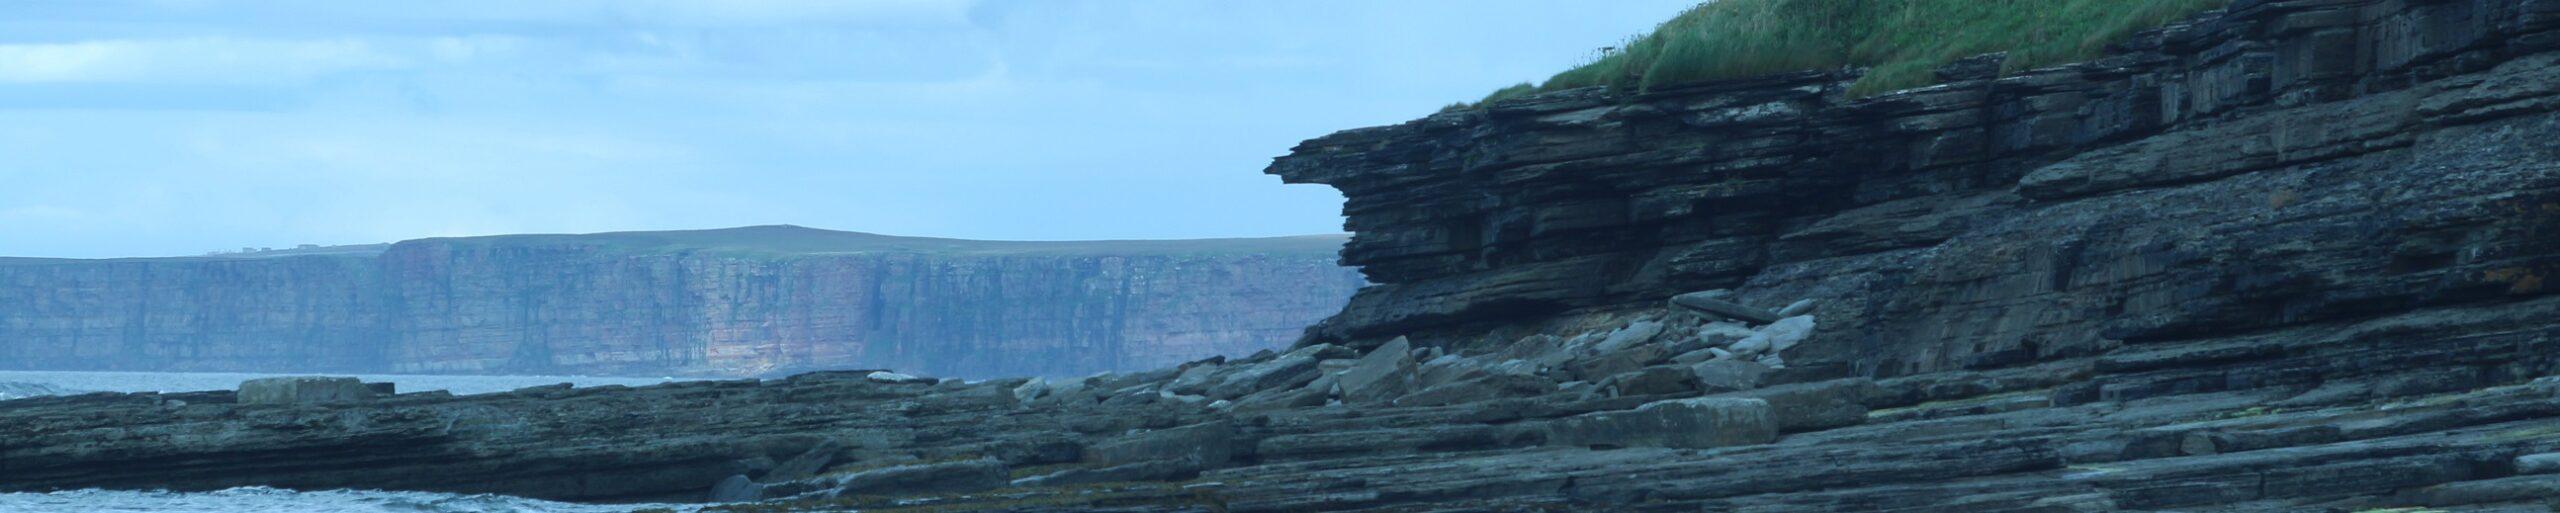 scotland fossils location